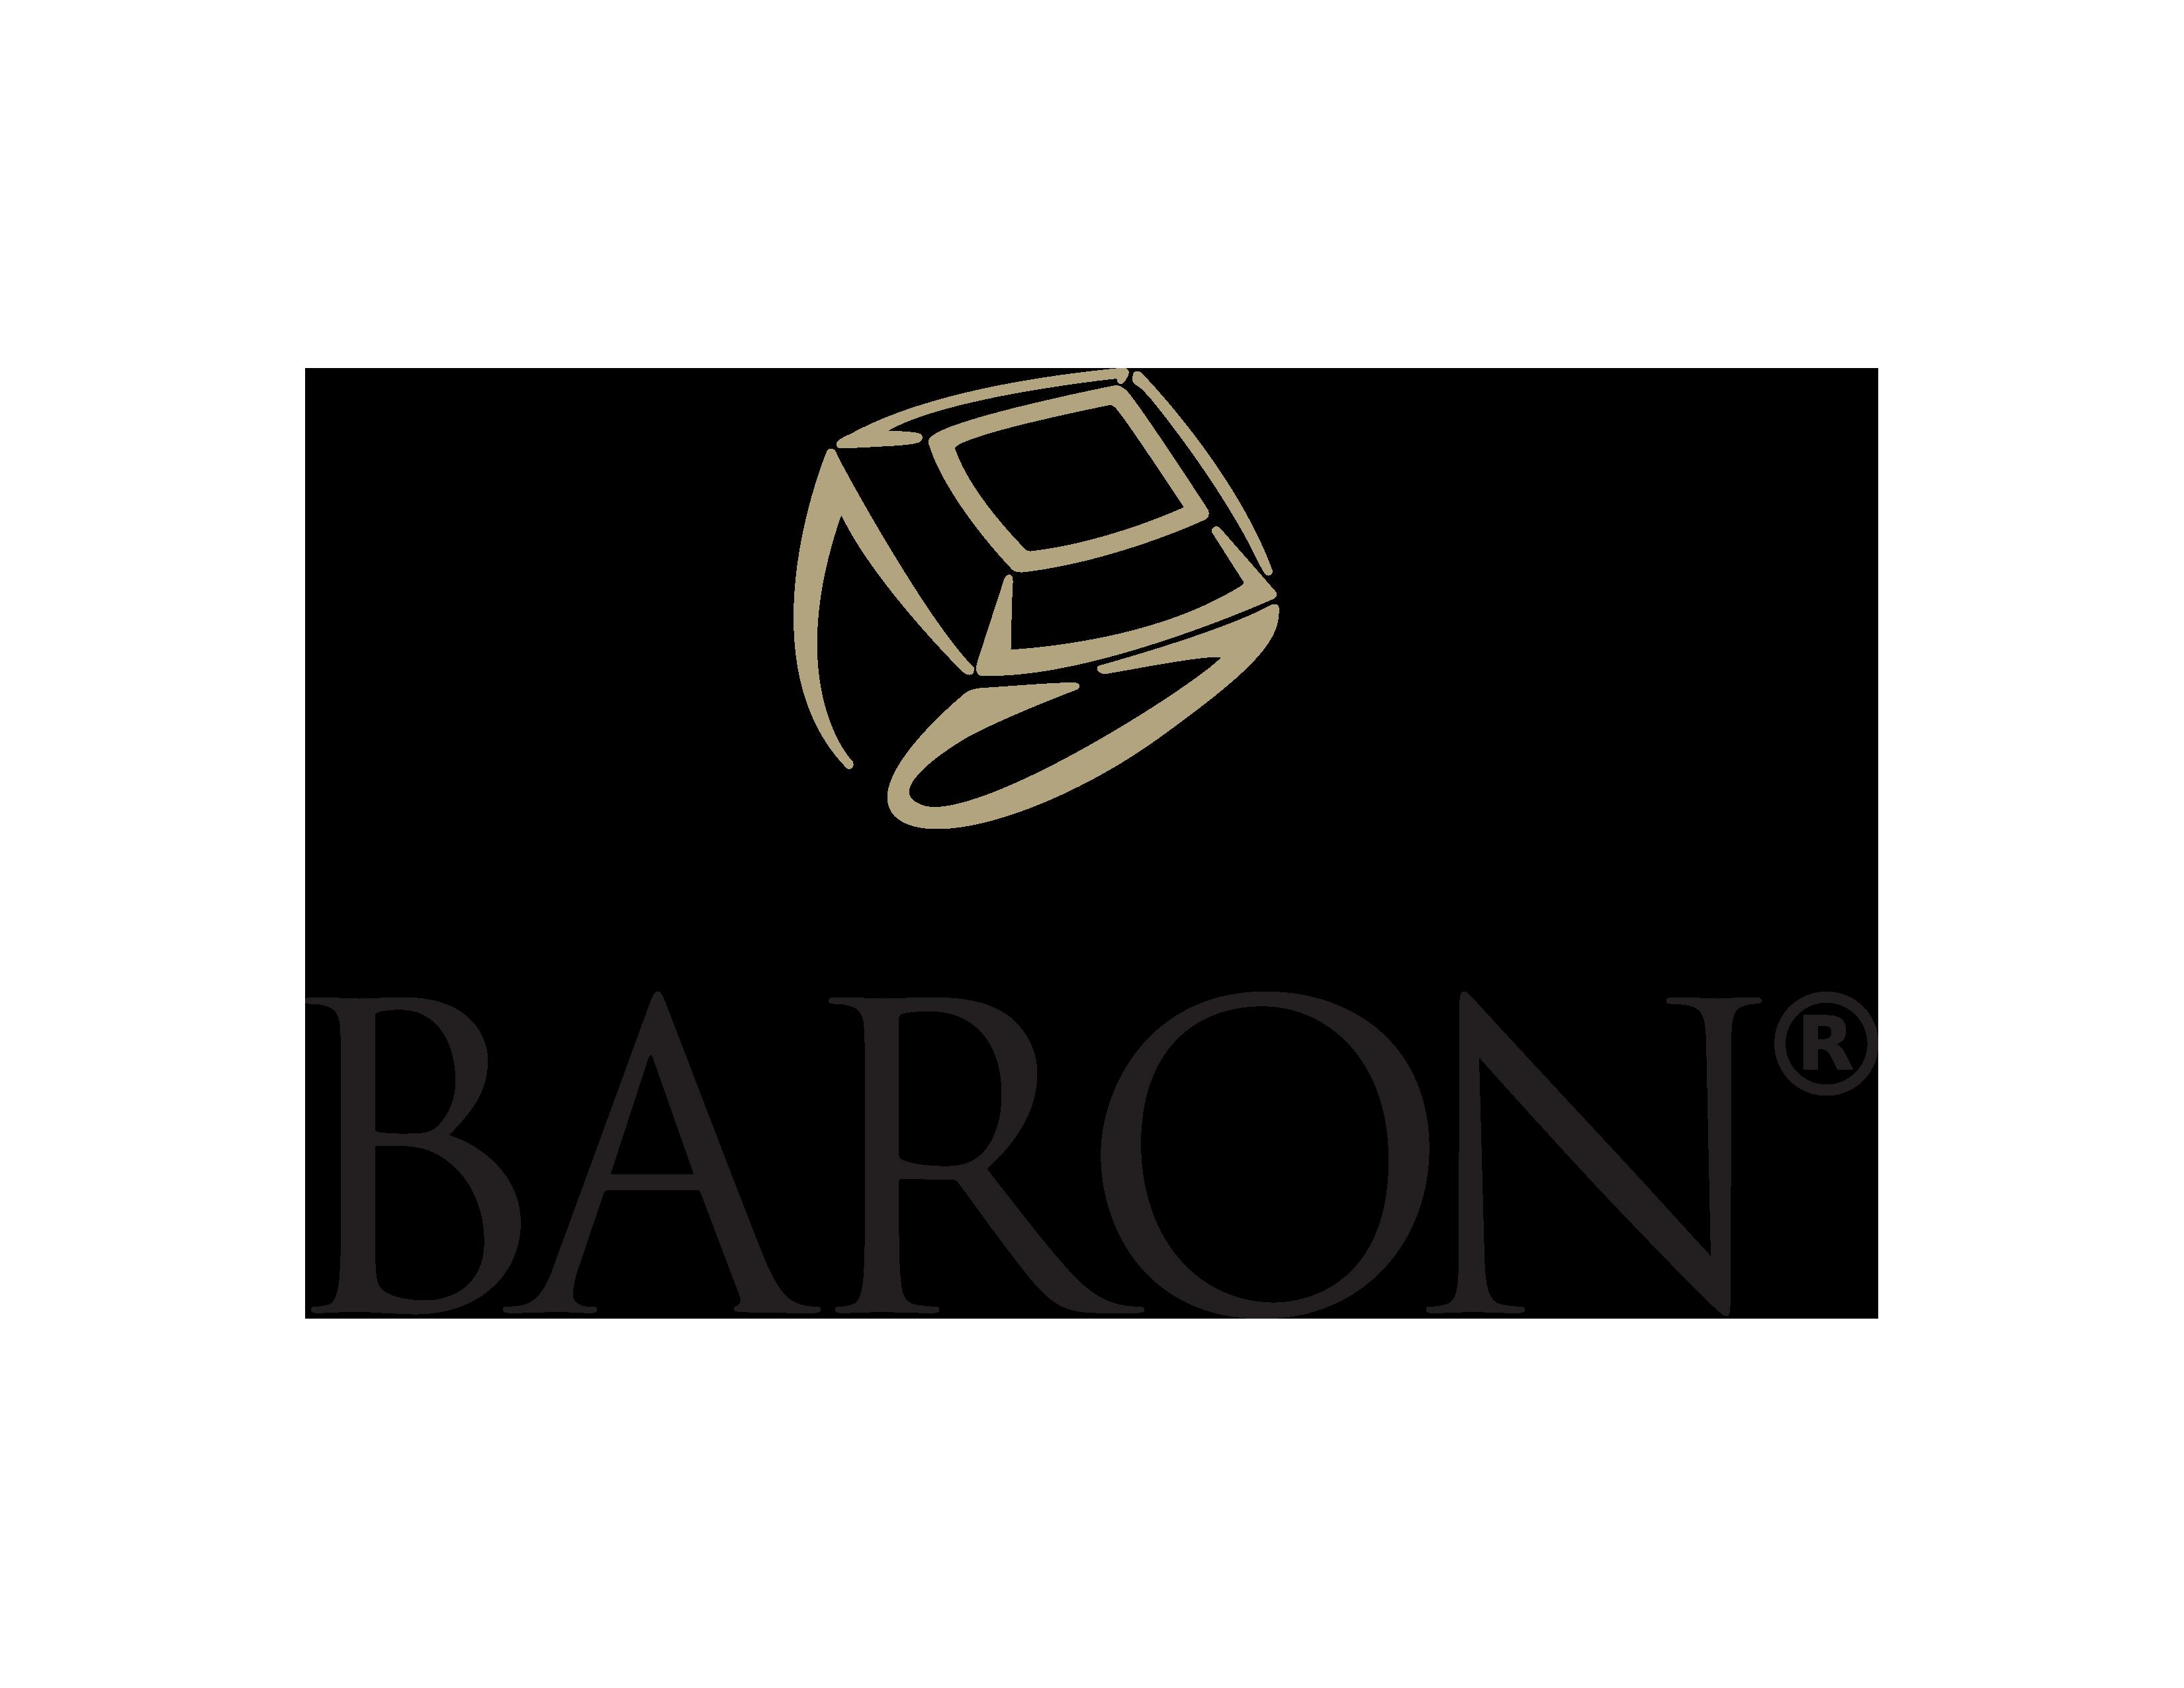 baron-logo-2018-black.png (159 KB)